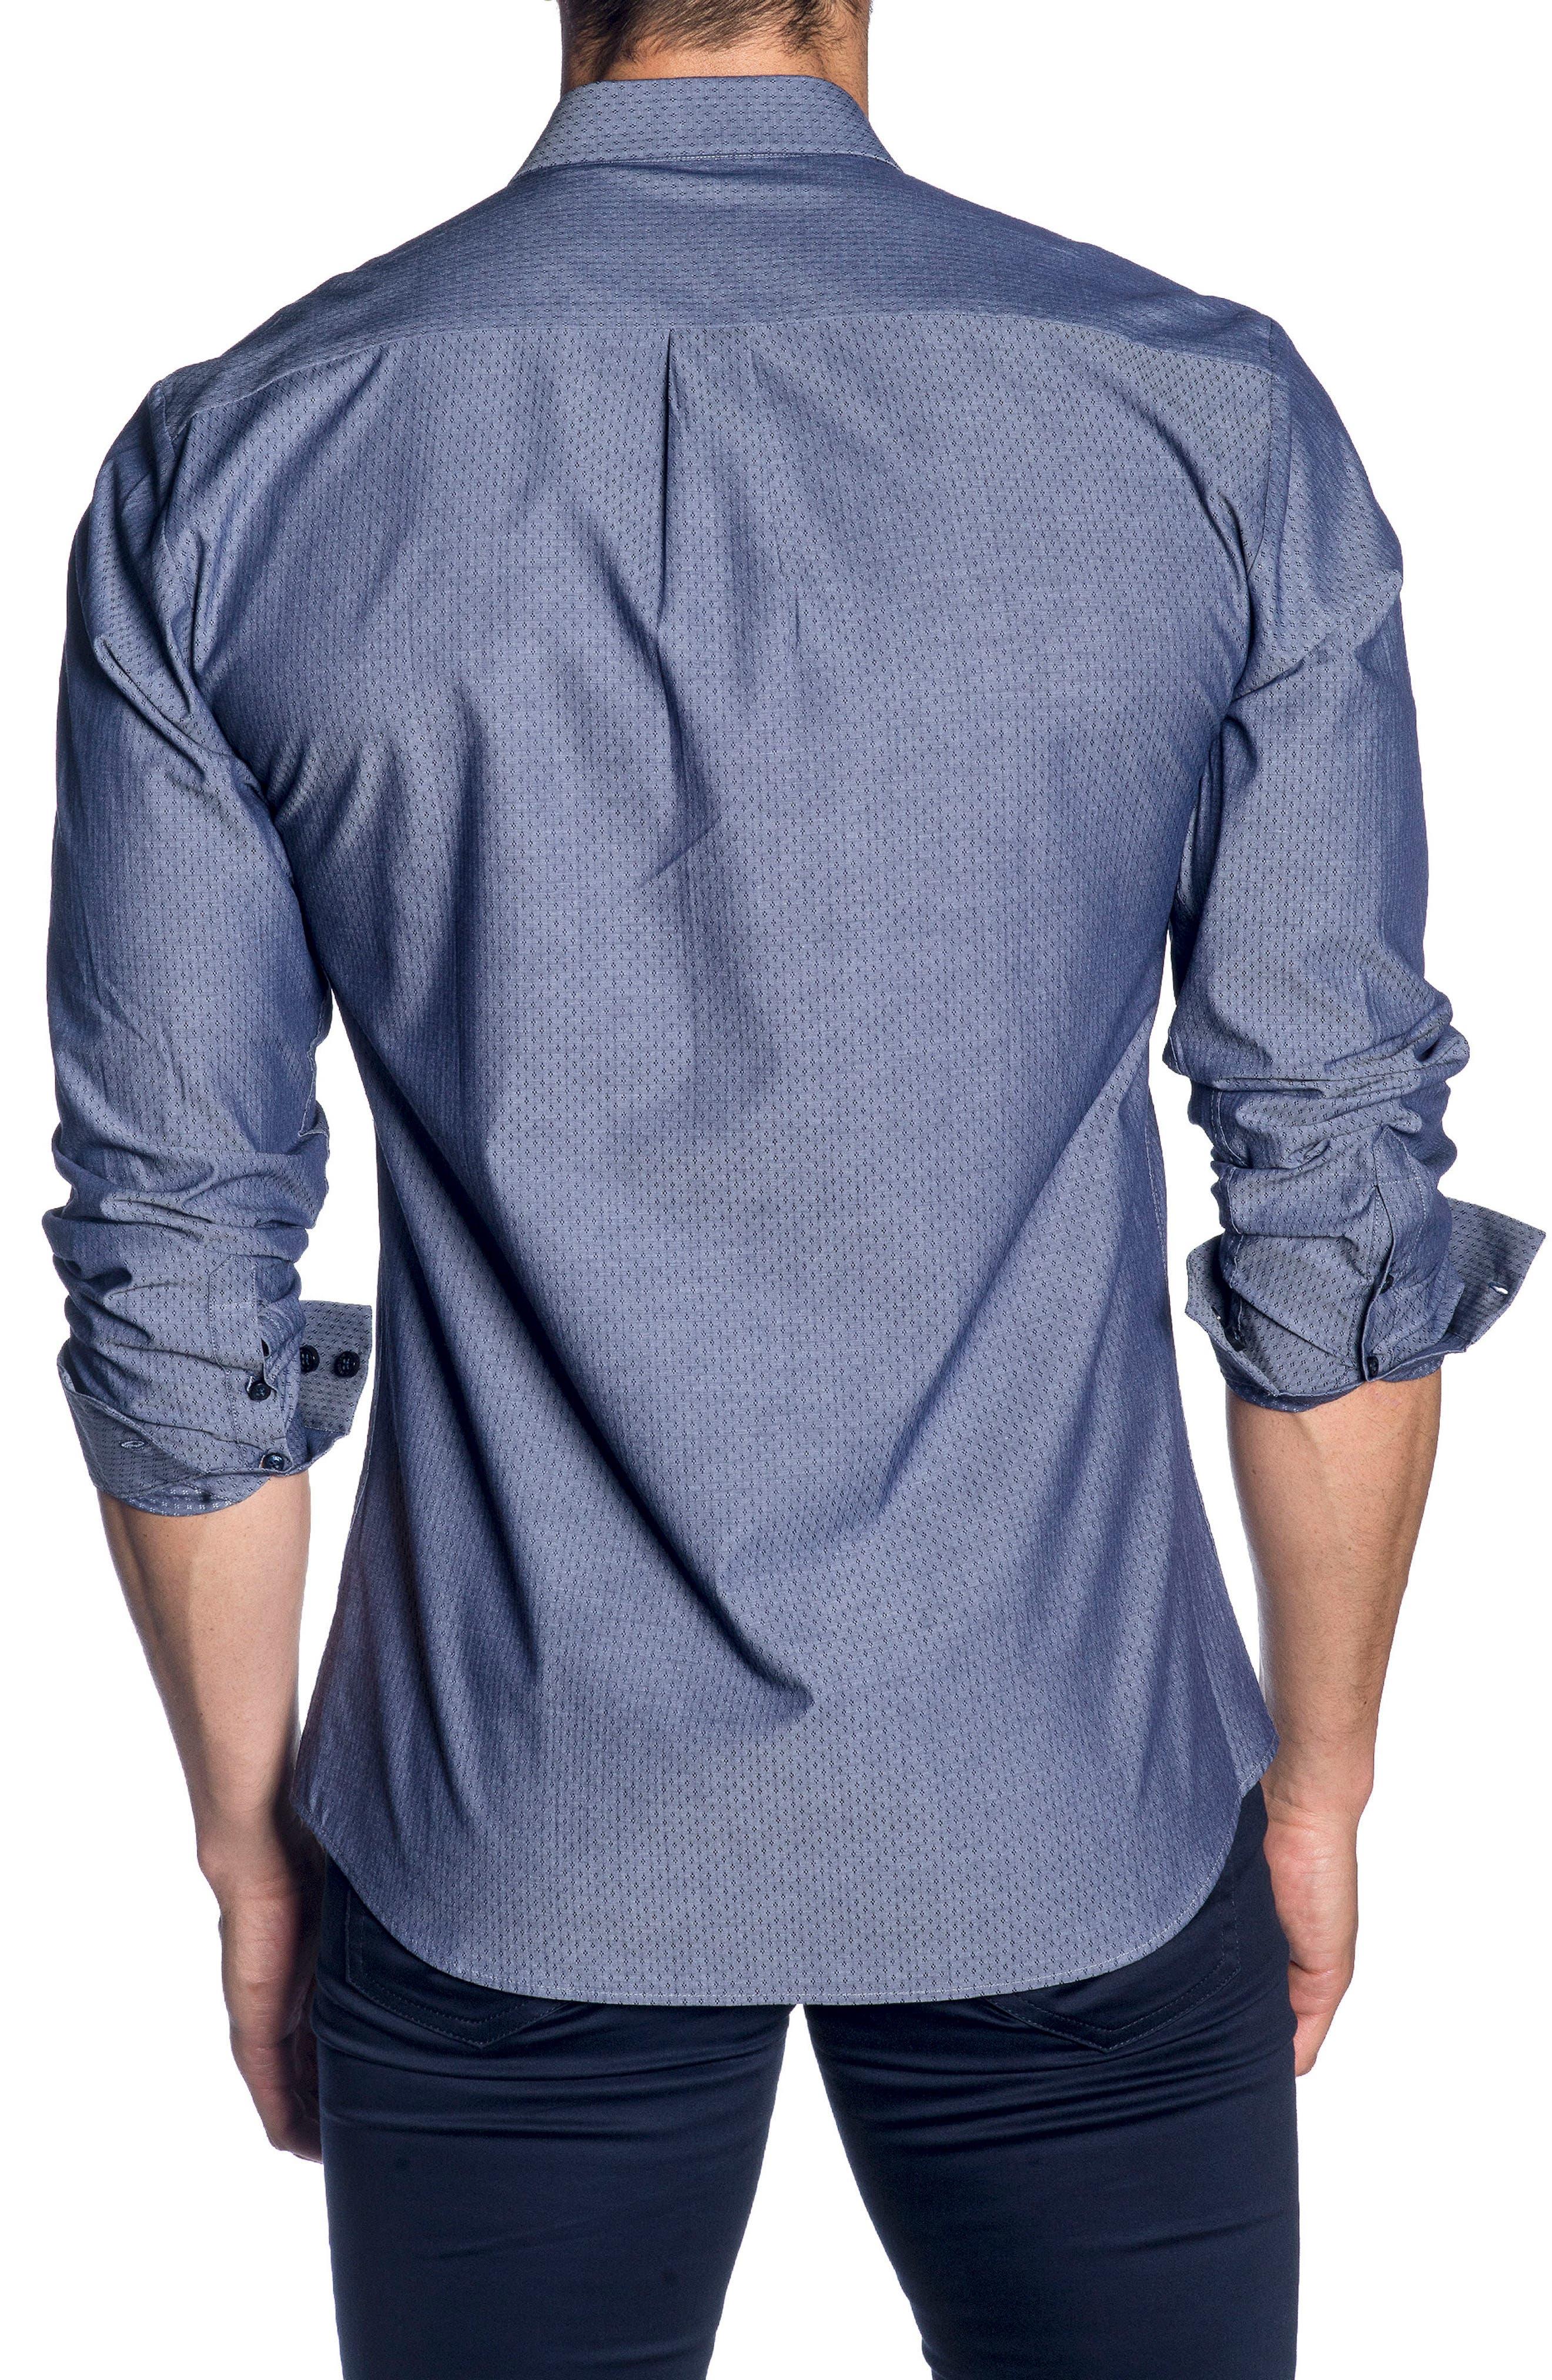 Trim Fit Sport Shirt,                             Alternate thumbnail 2, color,                             Blue Denim Jacquard